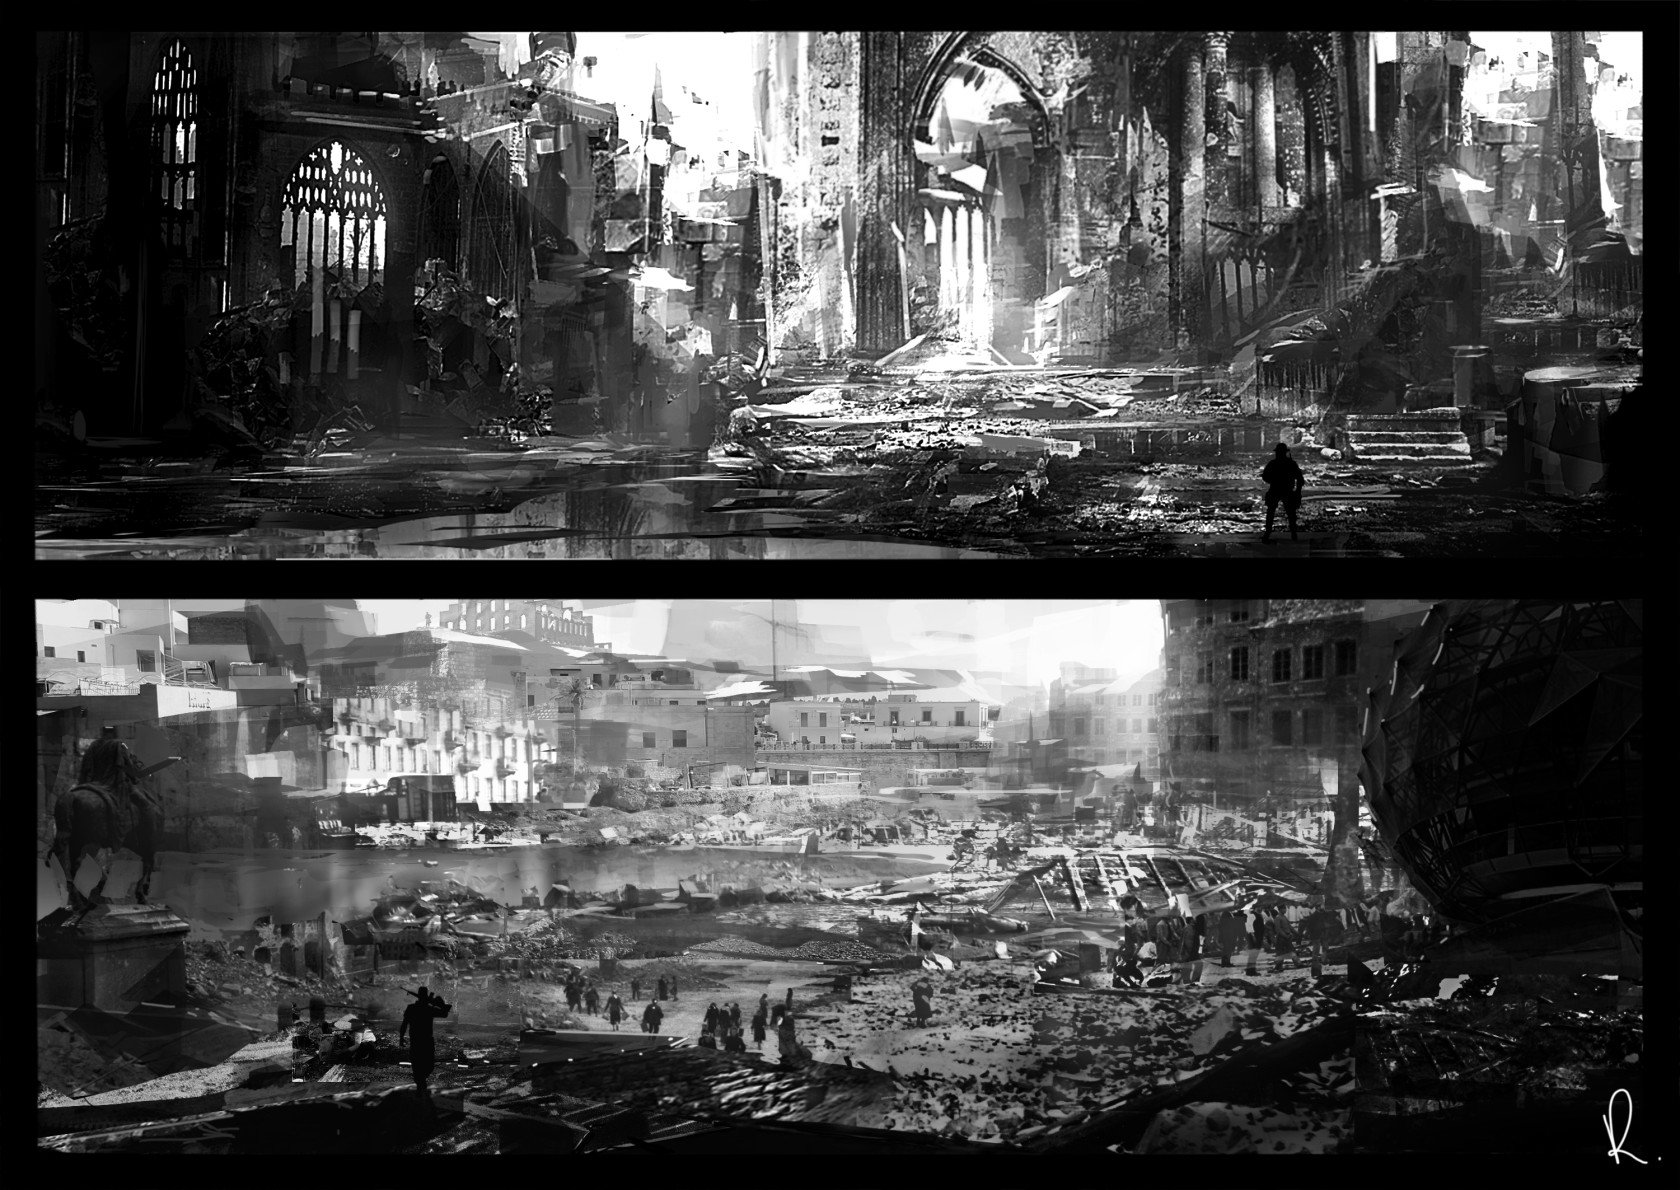 Marcin rubinkowski dwa tumbsy scalone 2 remake